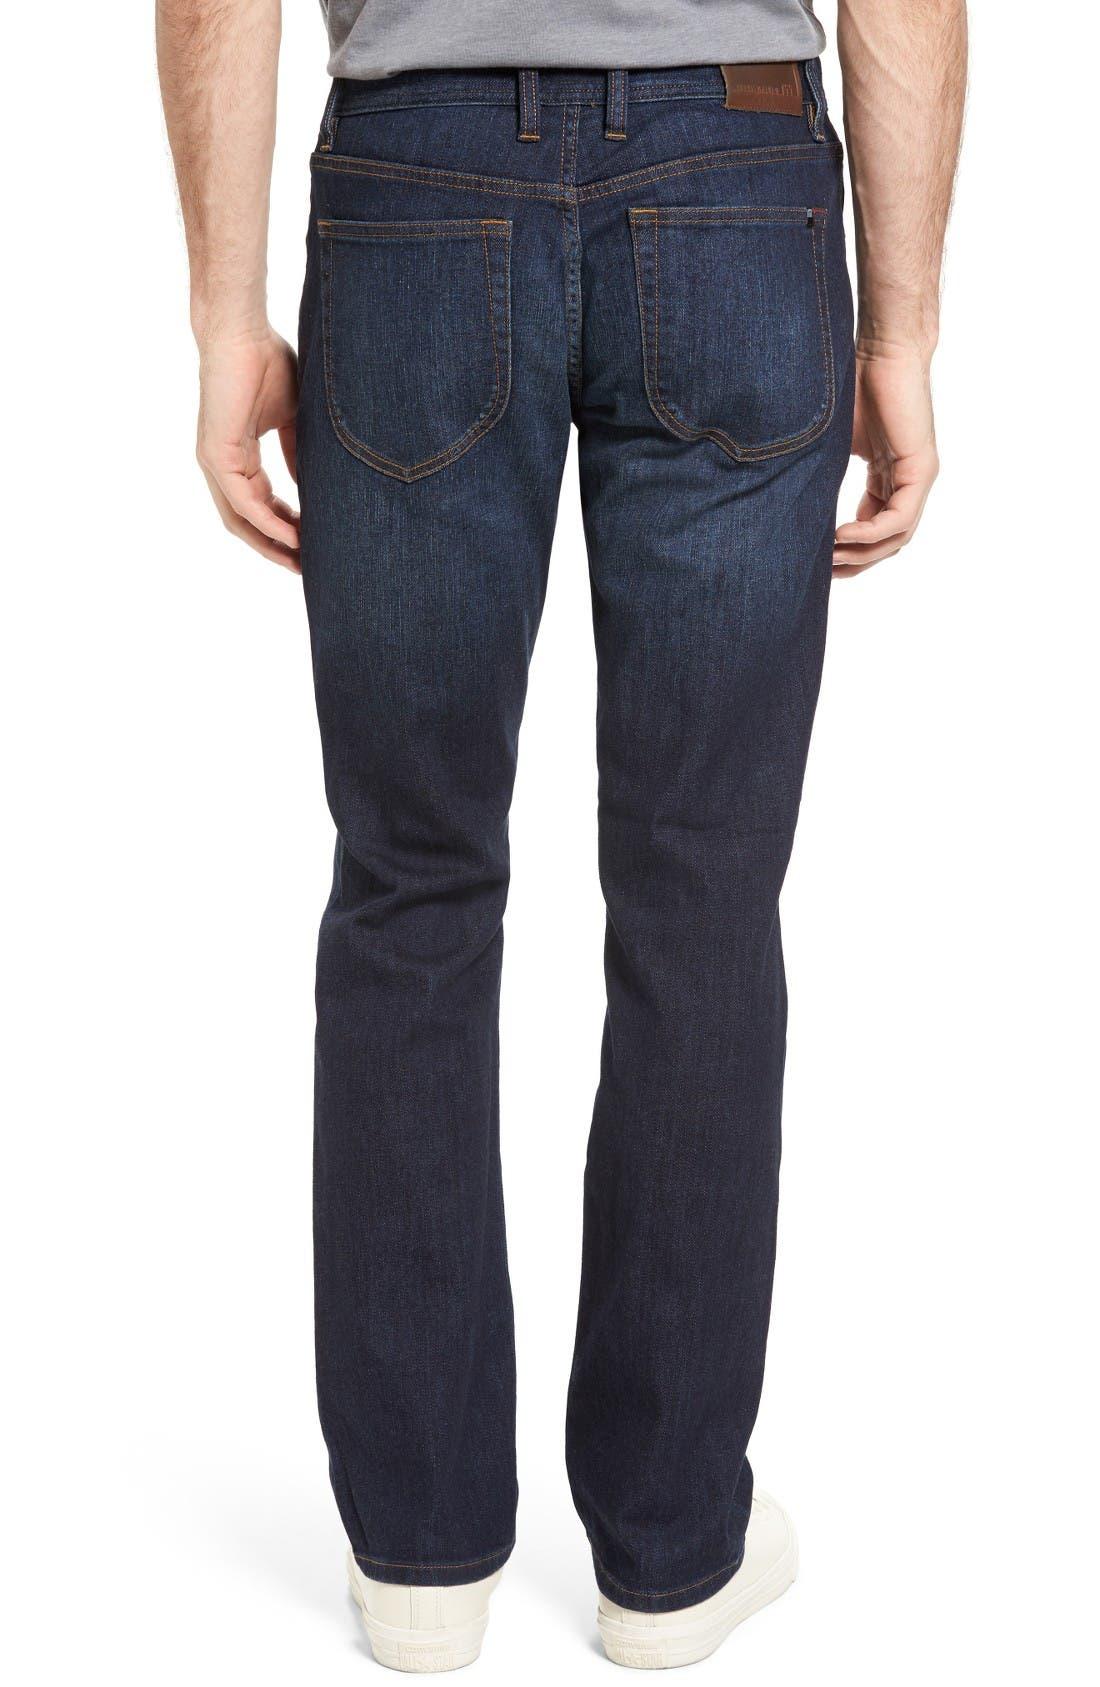 Alternate Image 2  - Travis Mathew 'Duke' Relaxed Fit Jeans (Vintage Indigo)